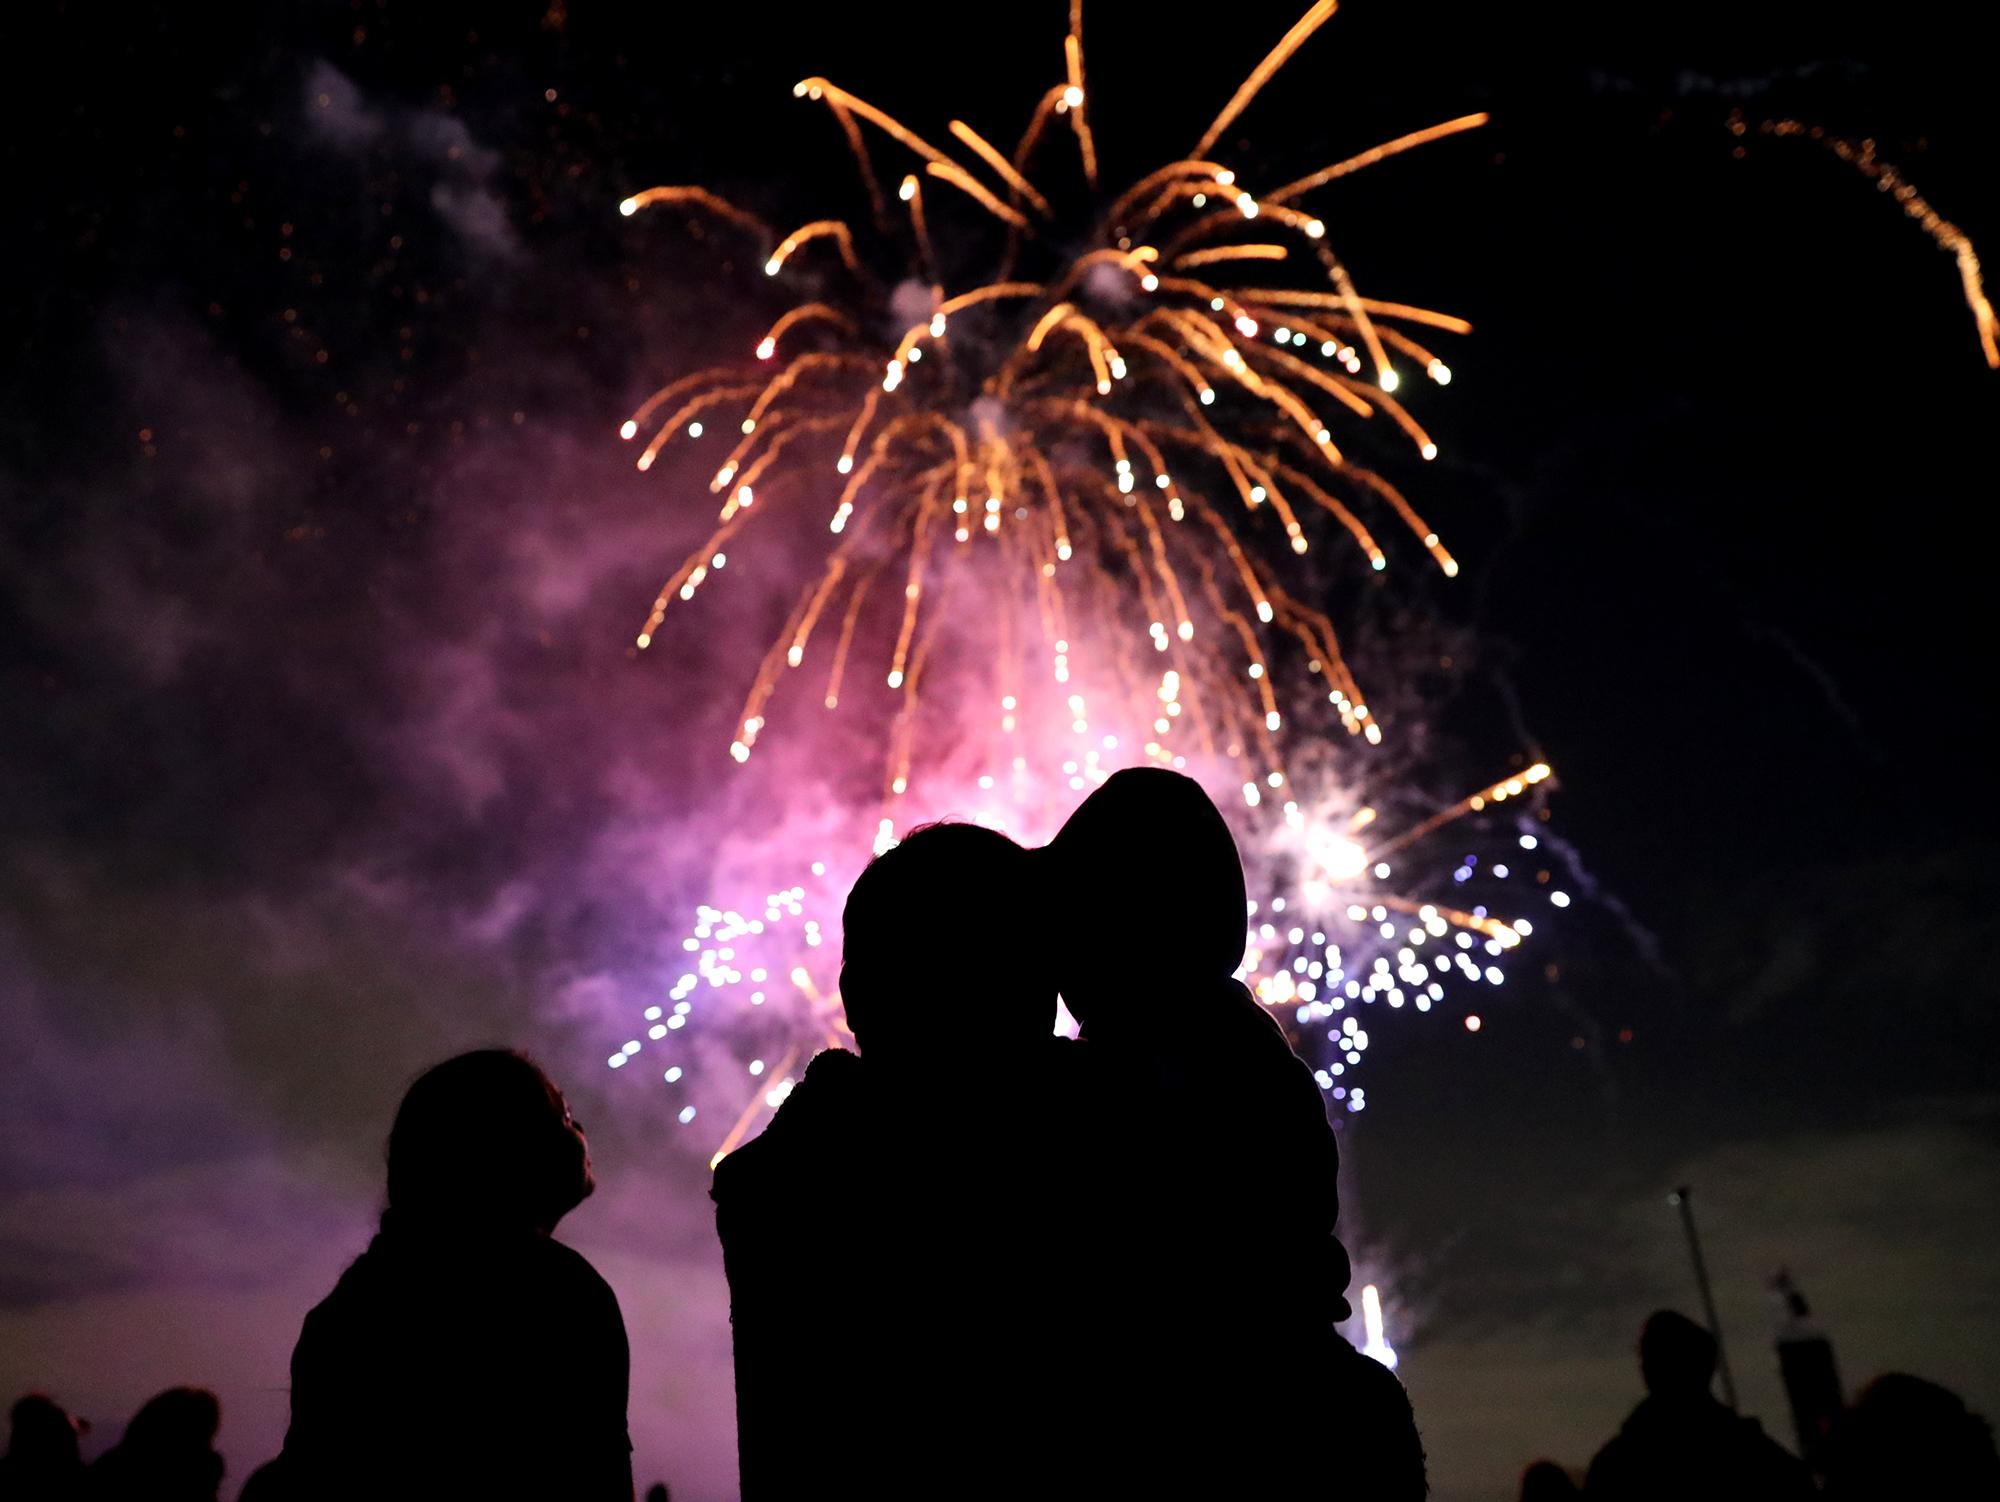 181107_london_diwali-fireworks_05